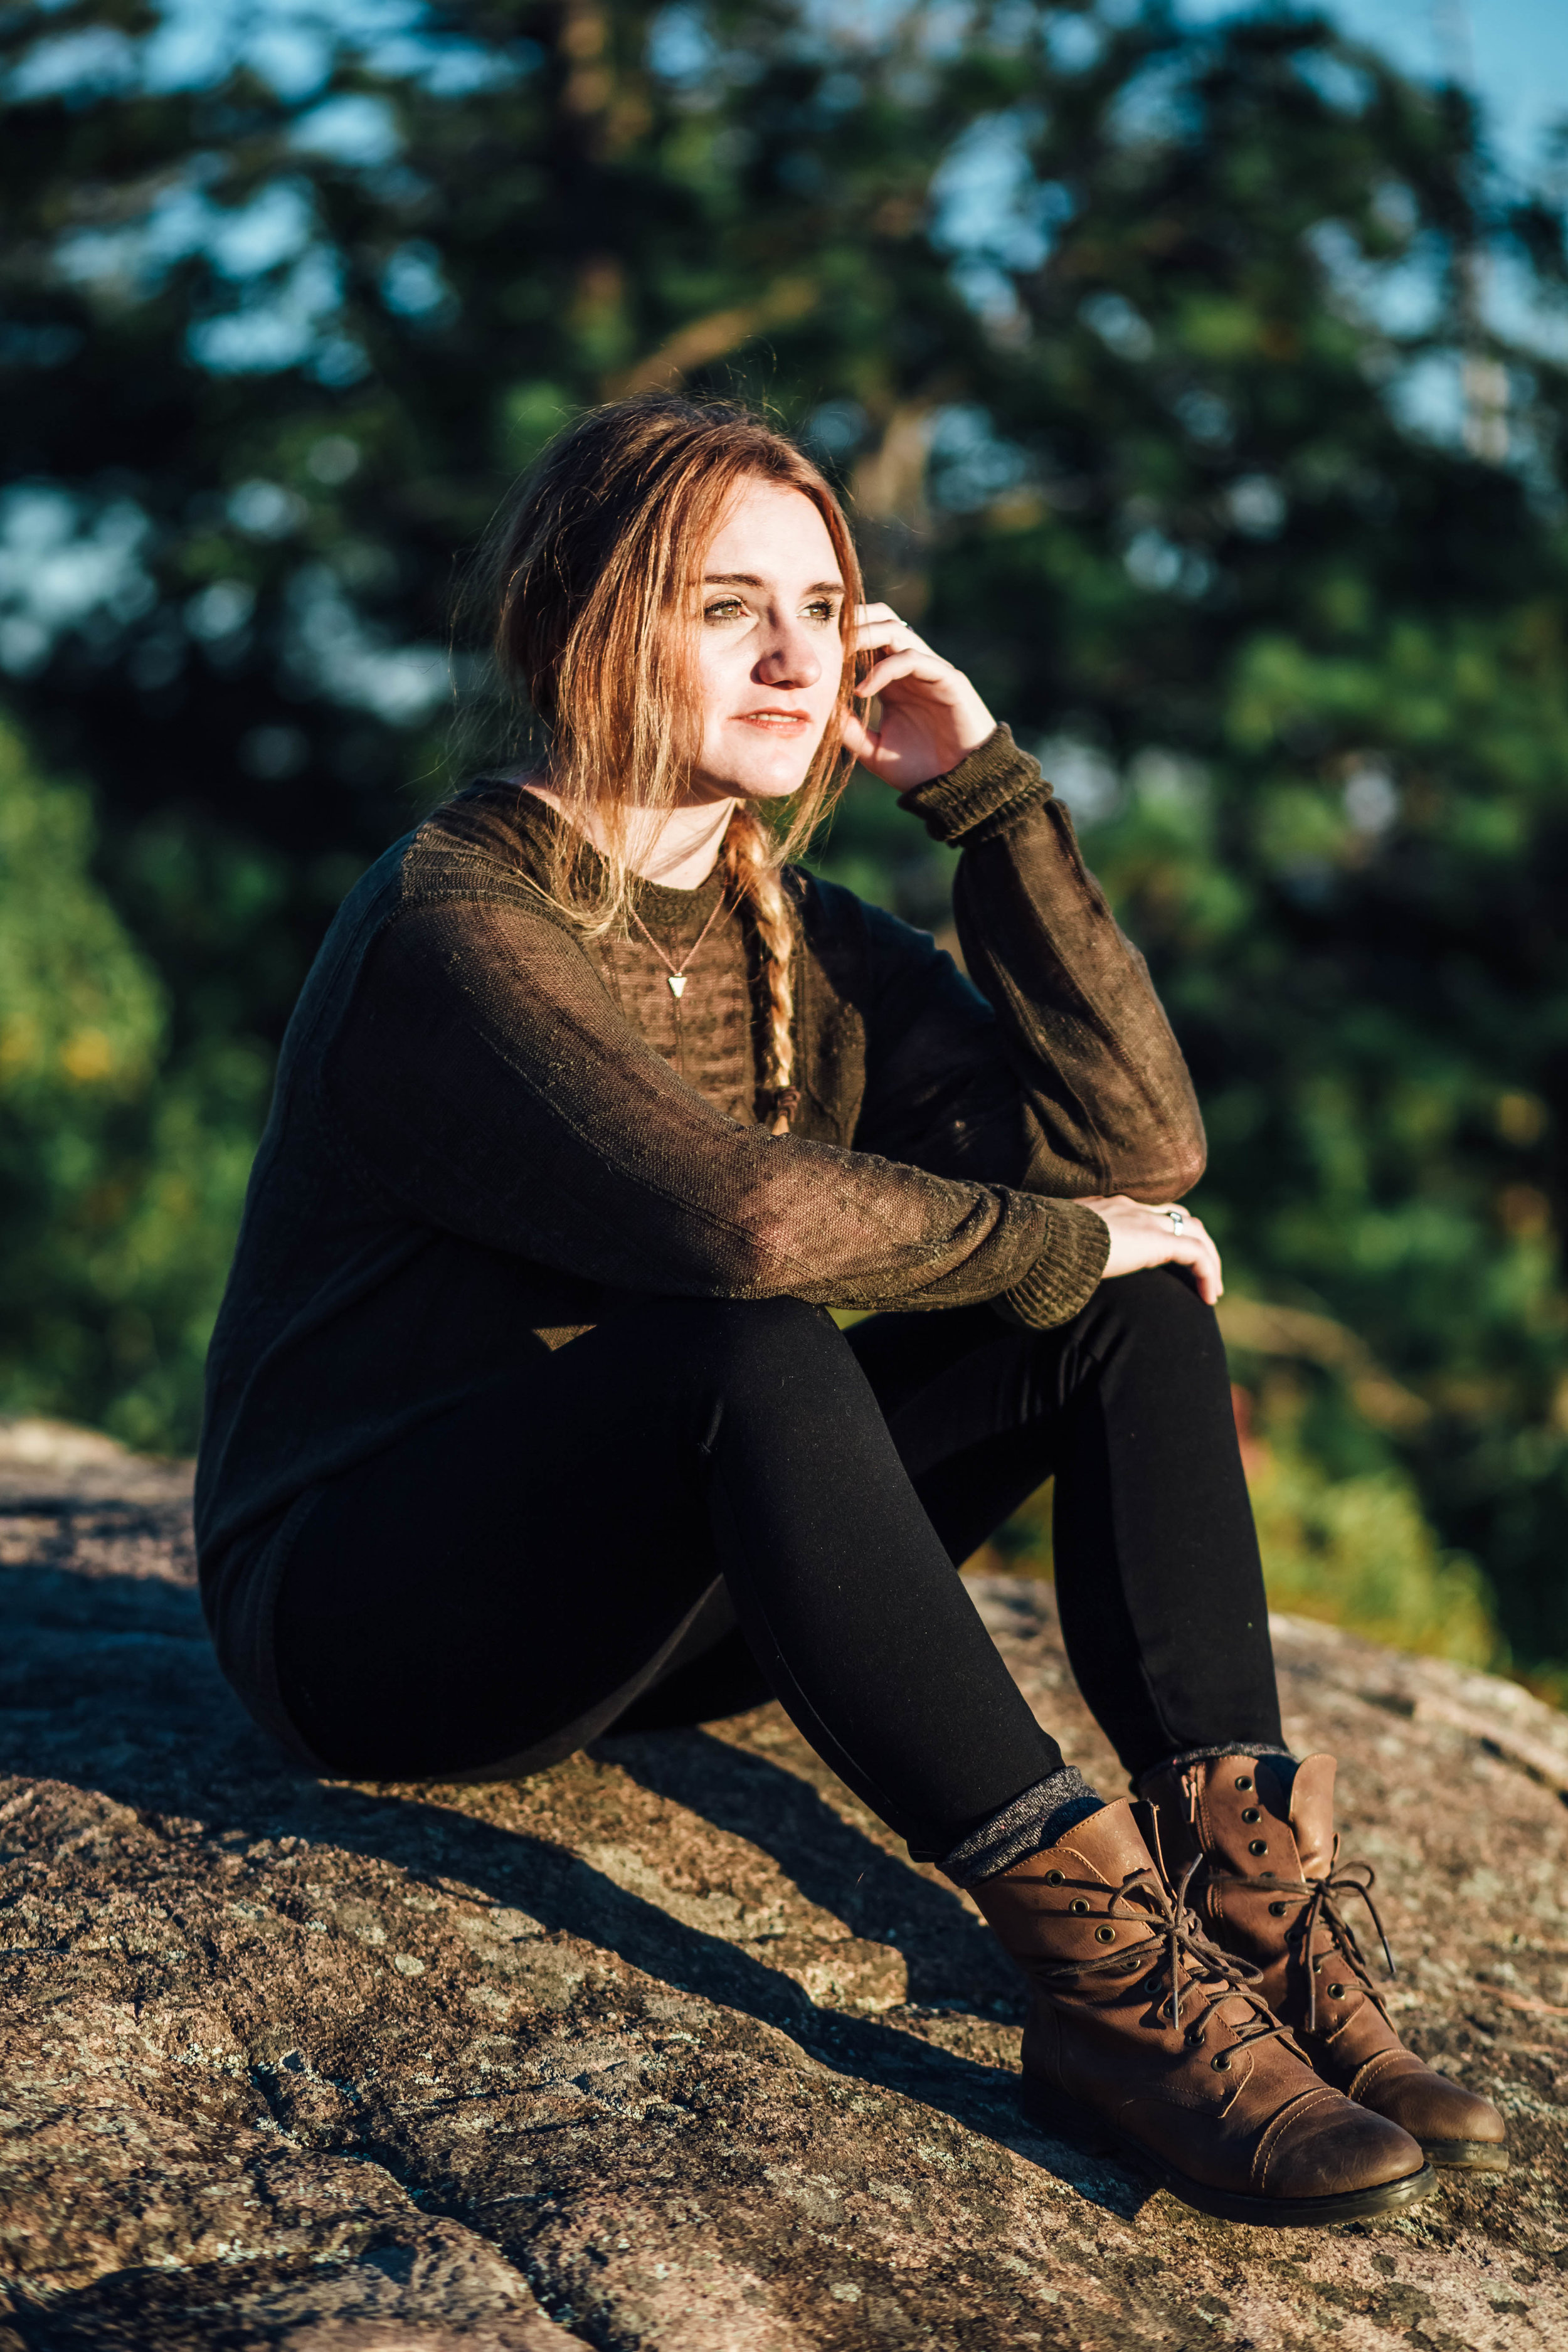 Lifestyle Portraits - Sabrina Leigh Studios - Northern Michgian Portrait Photographer 32.jpg